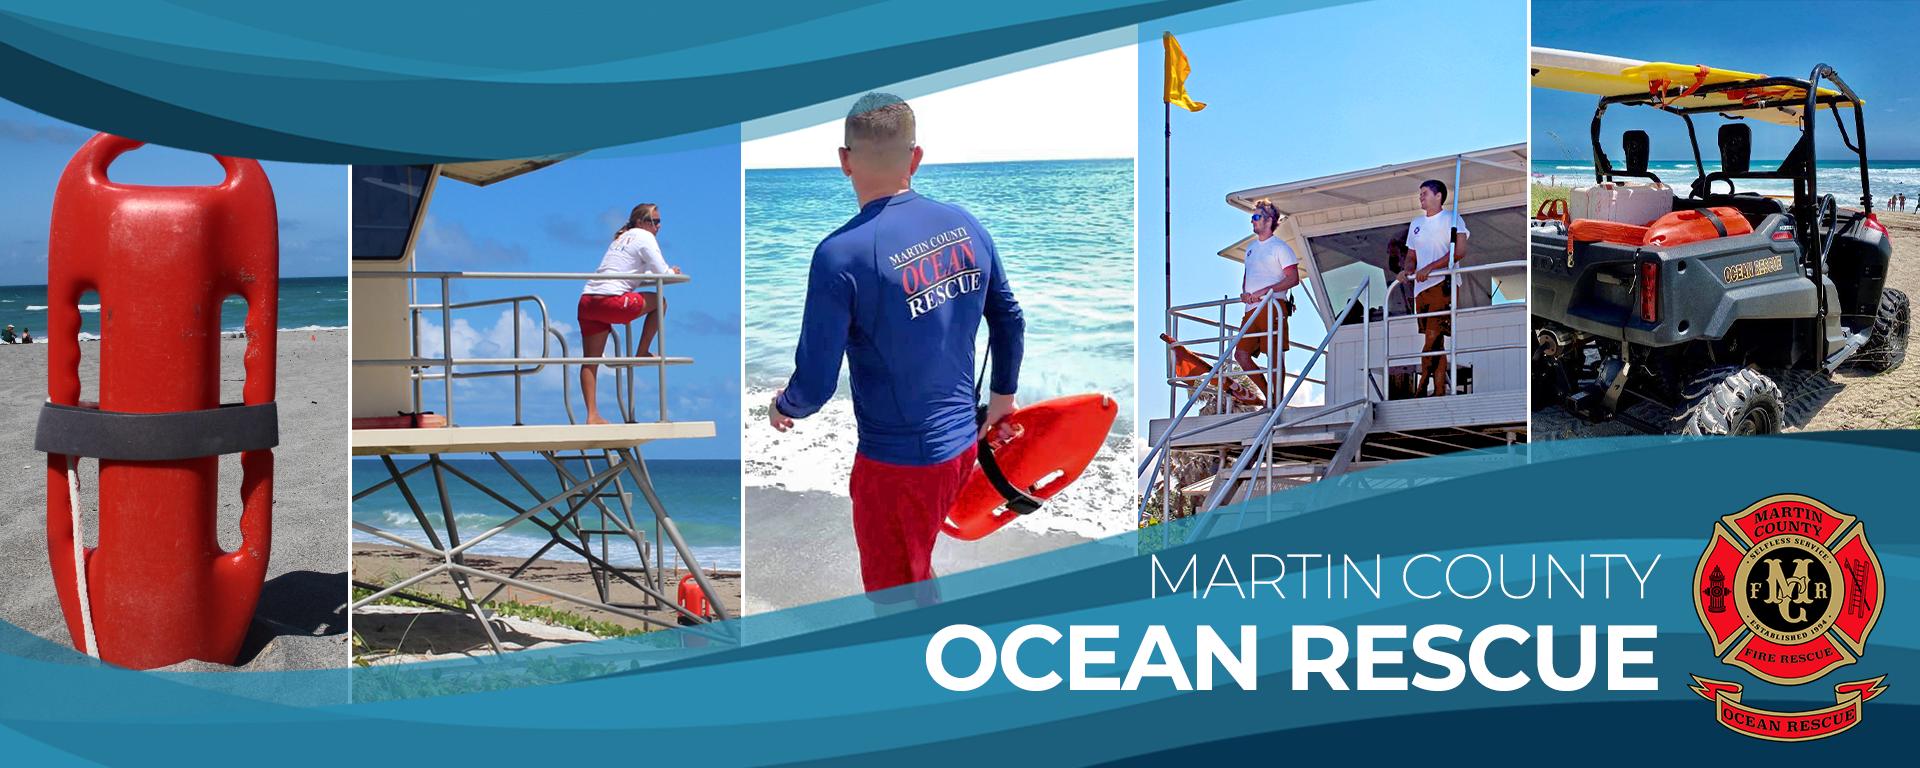 Martin County Ocean Rescue lifeguards and the Martin County Fire Rescue Logo